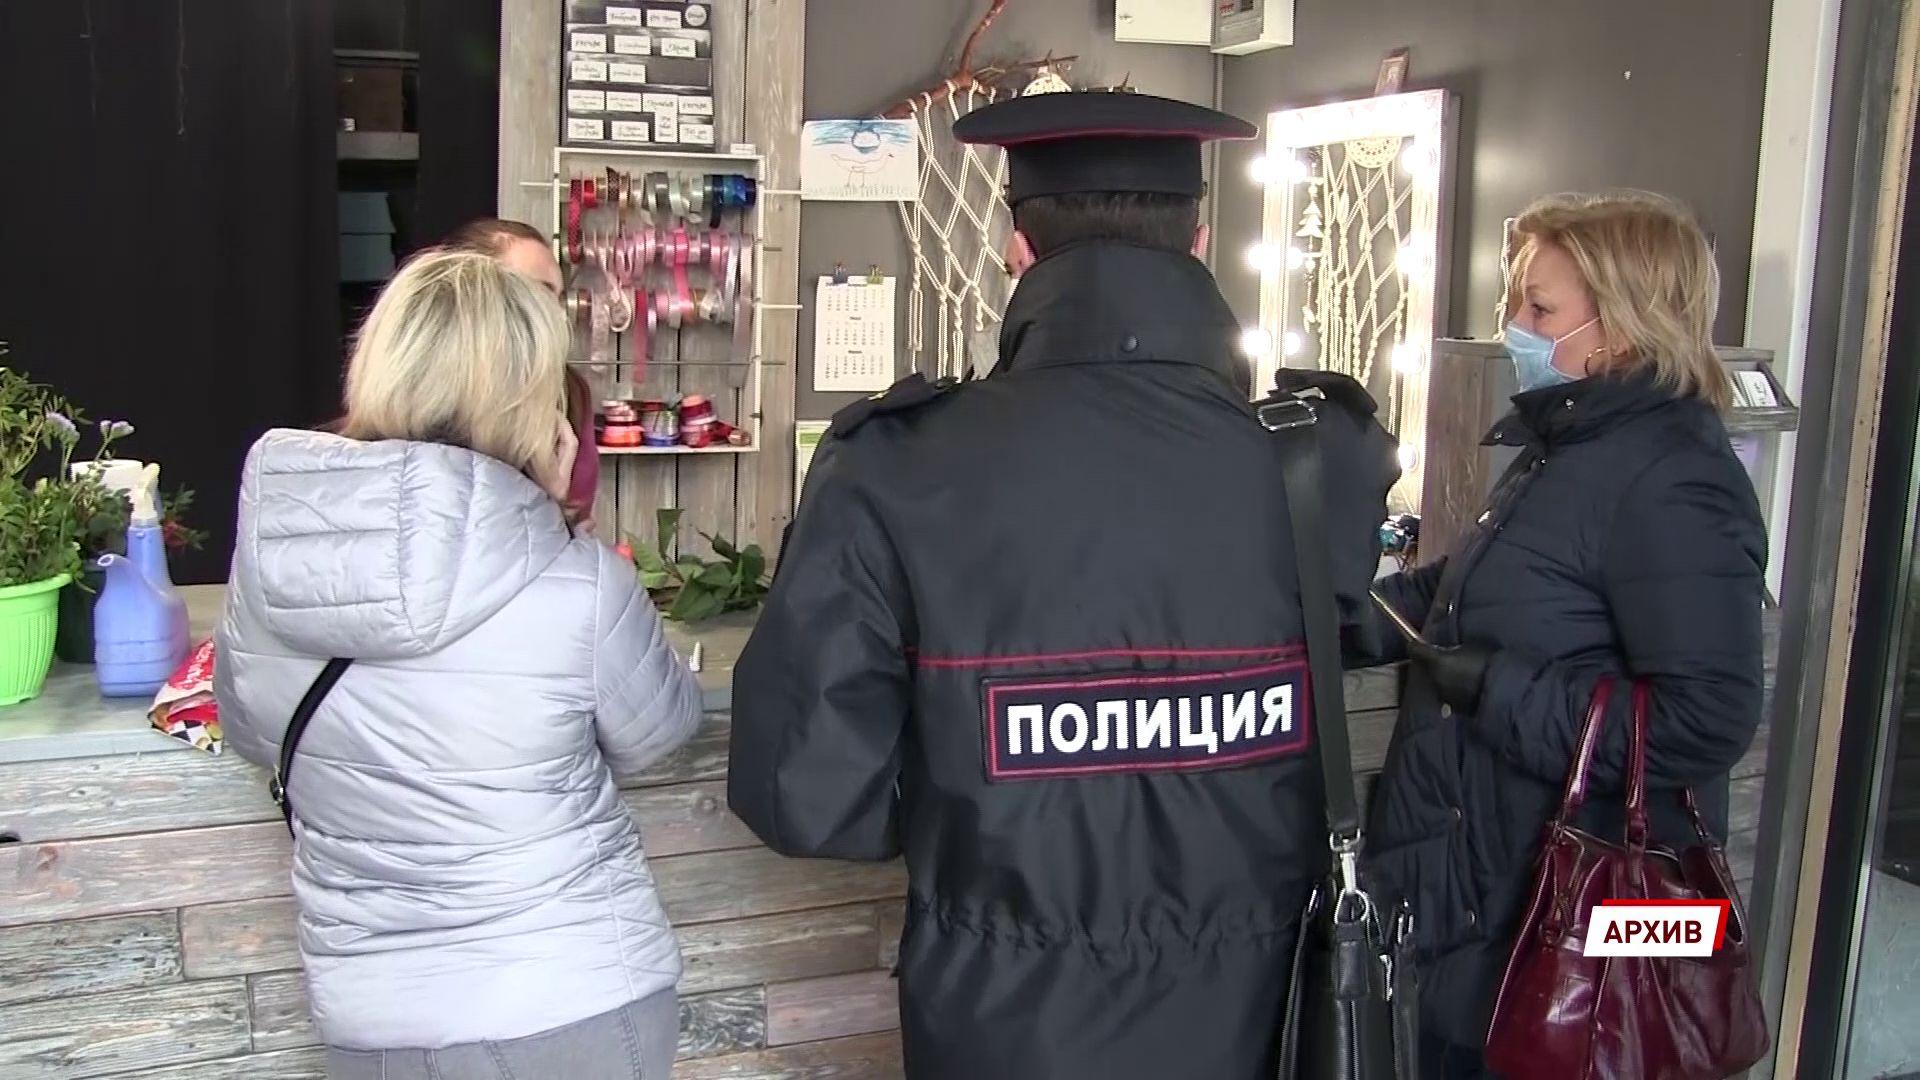 Ярославца оштрафовали за отсутствие маски